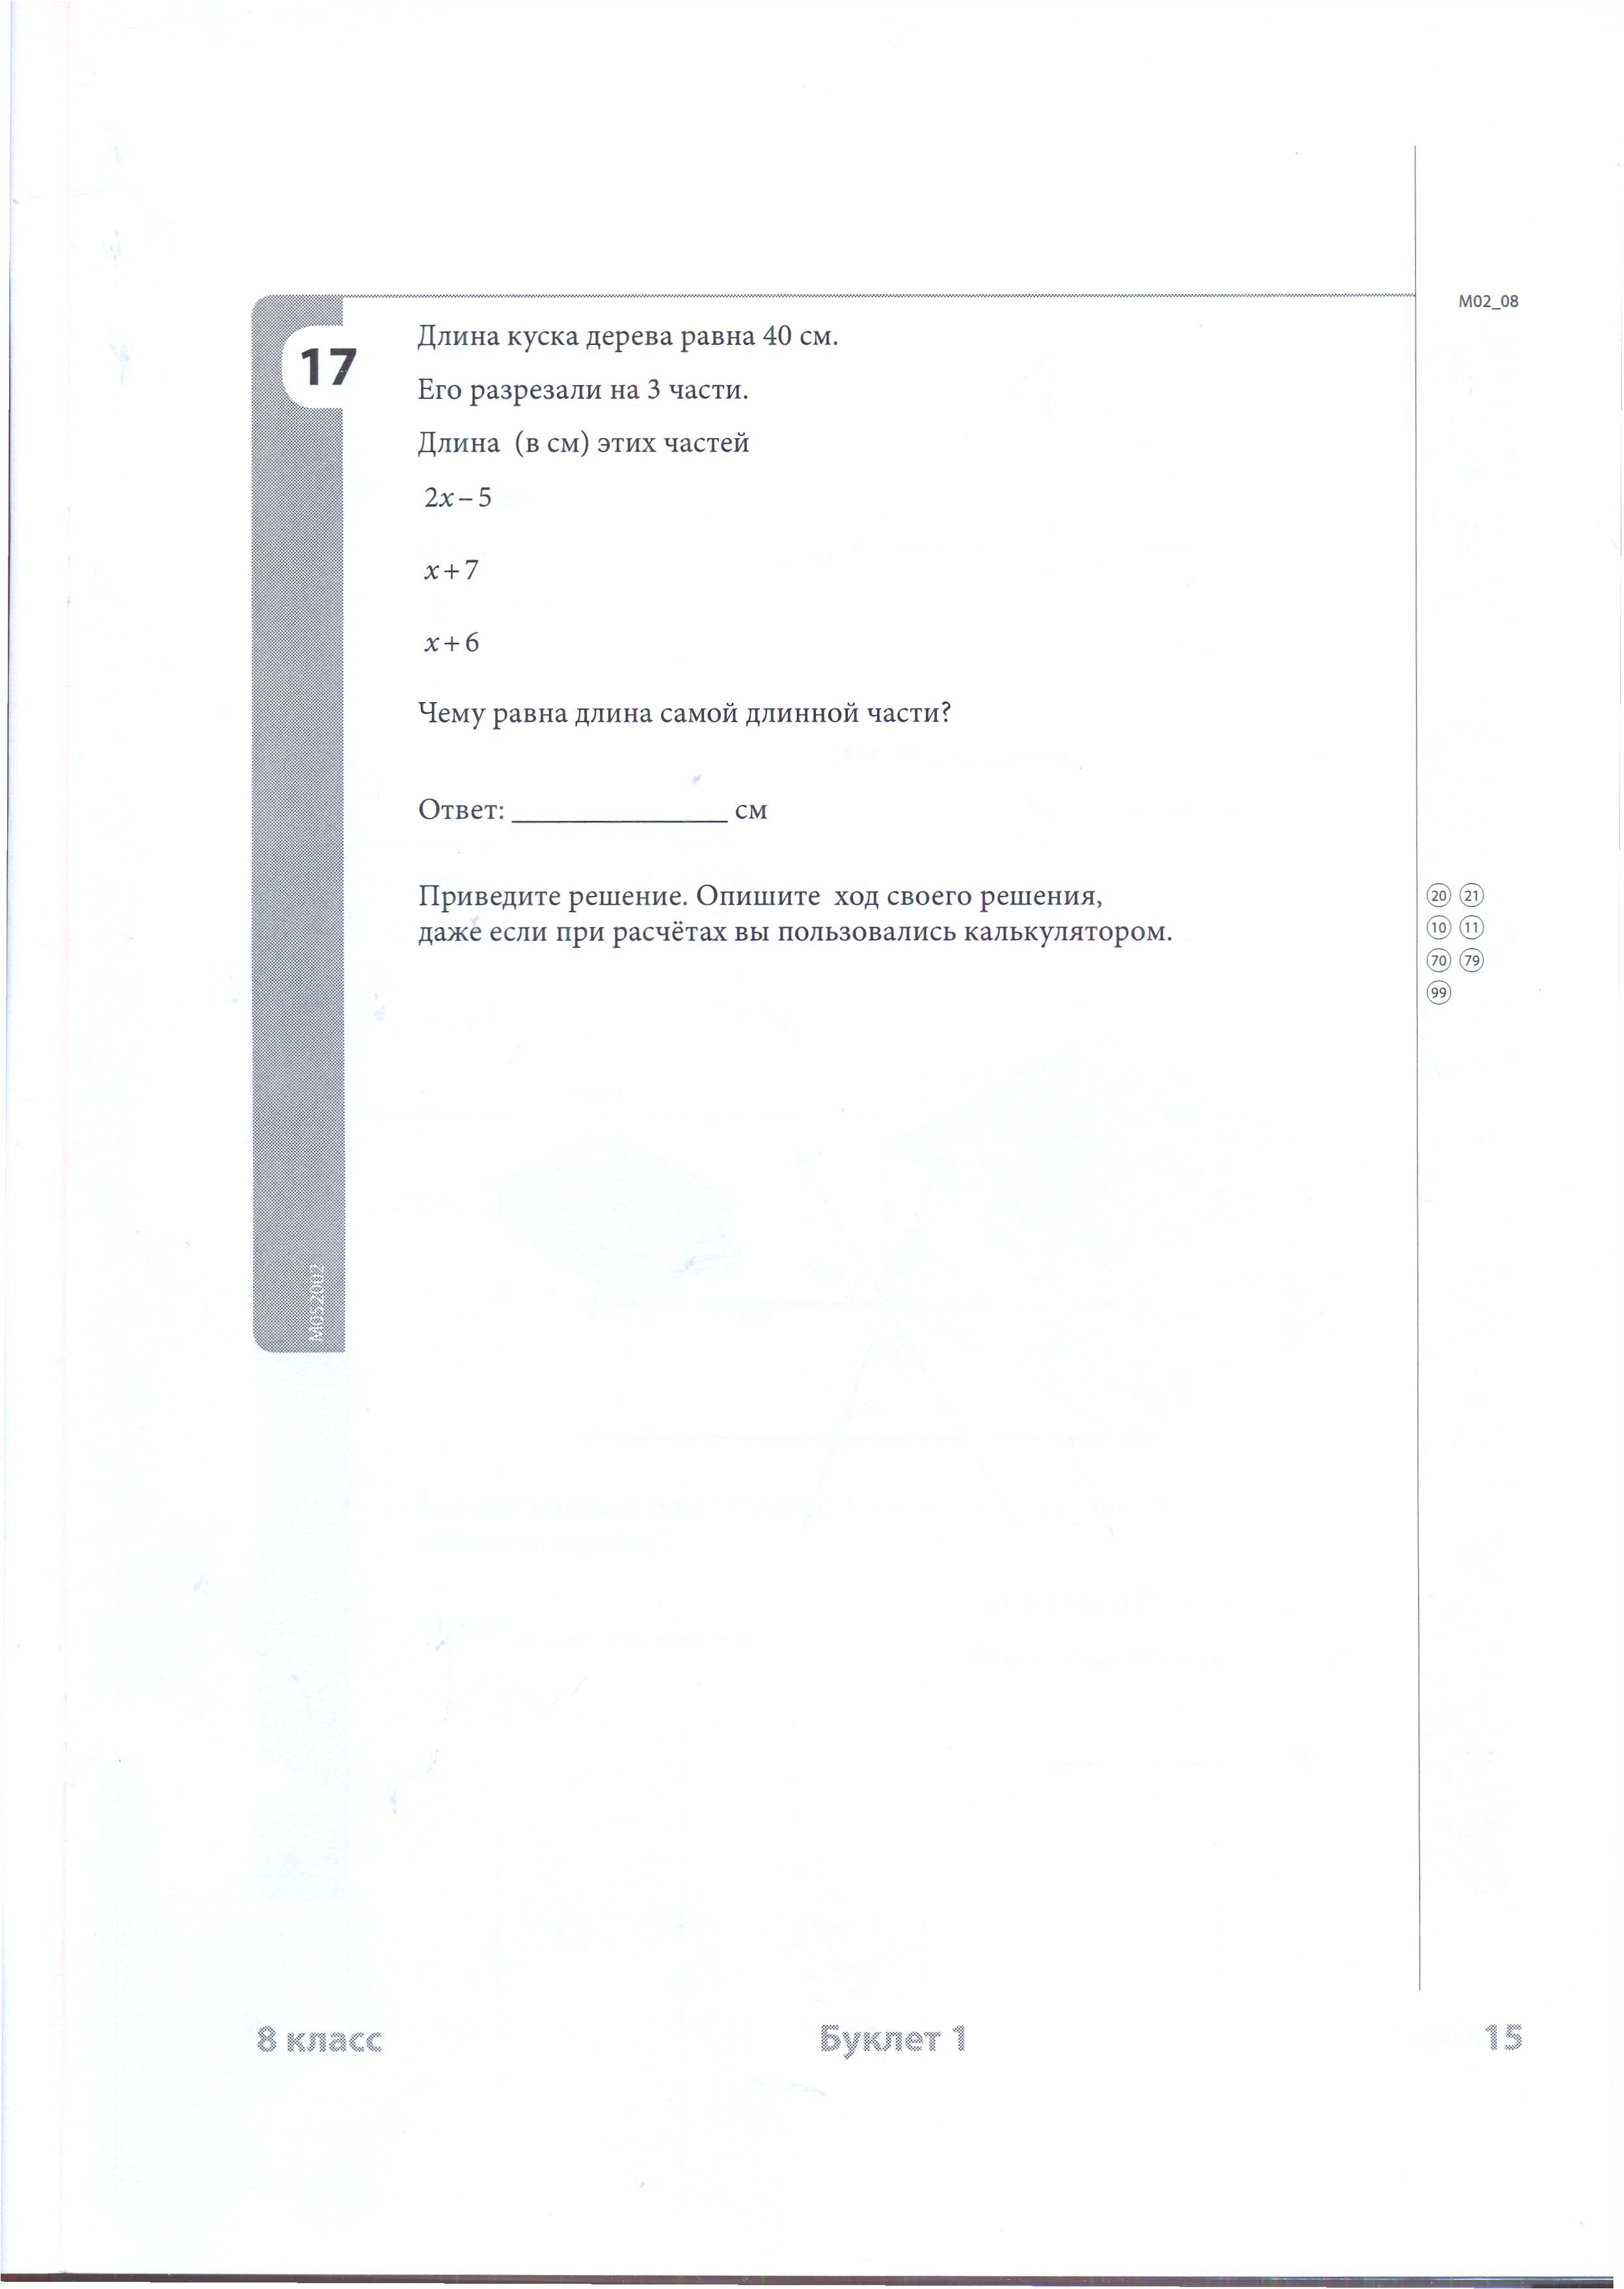 H:\Доклад ТИМСС Алматы 8.04.2014\TIMSS MATEM 8 kl_1 var\Matematic 8 kl_1 var0011.jpg